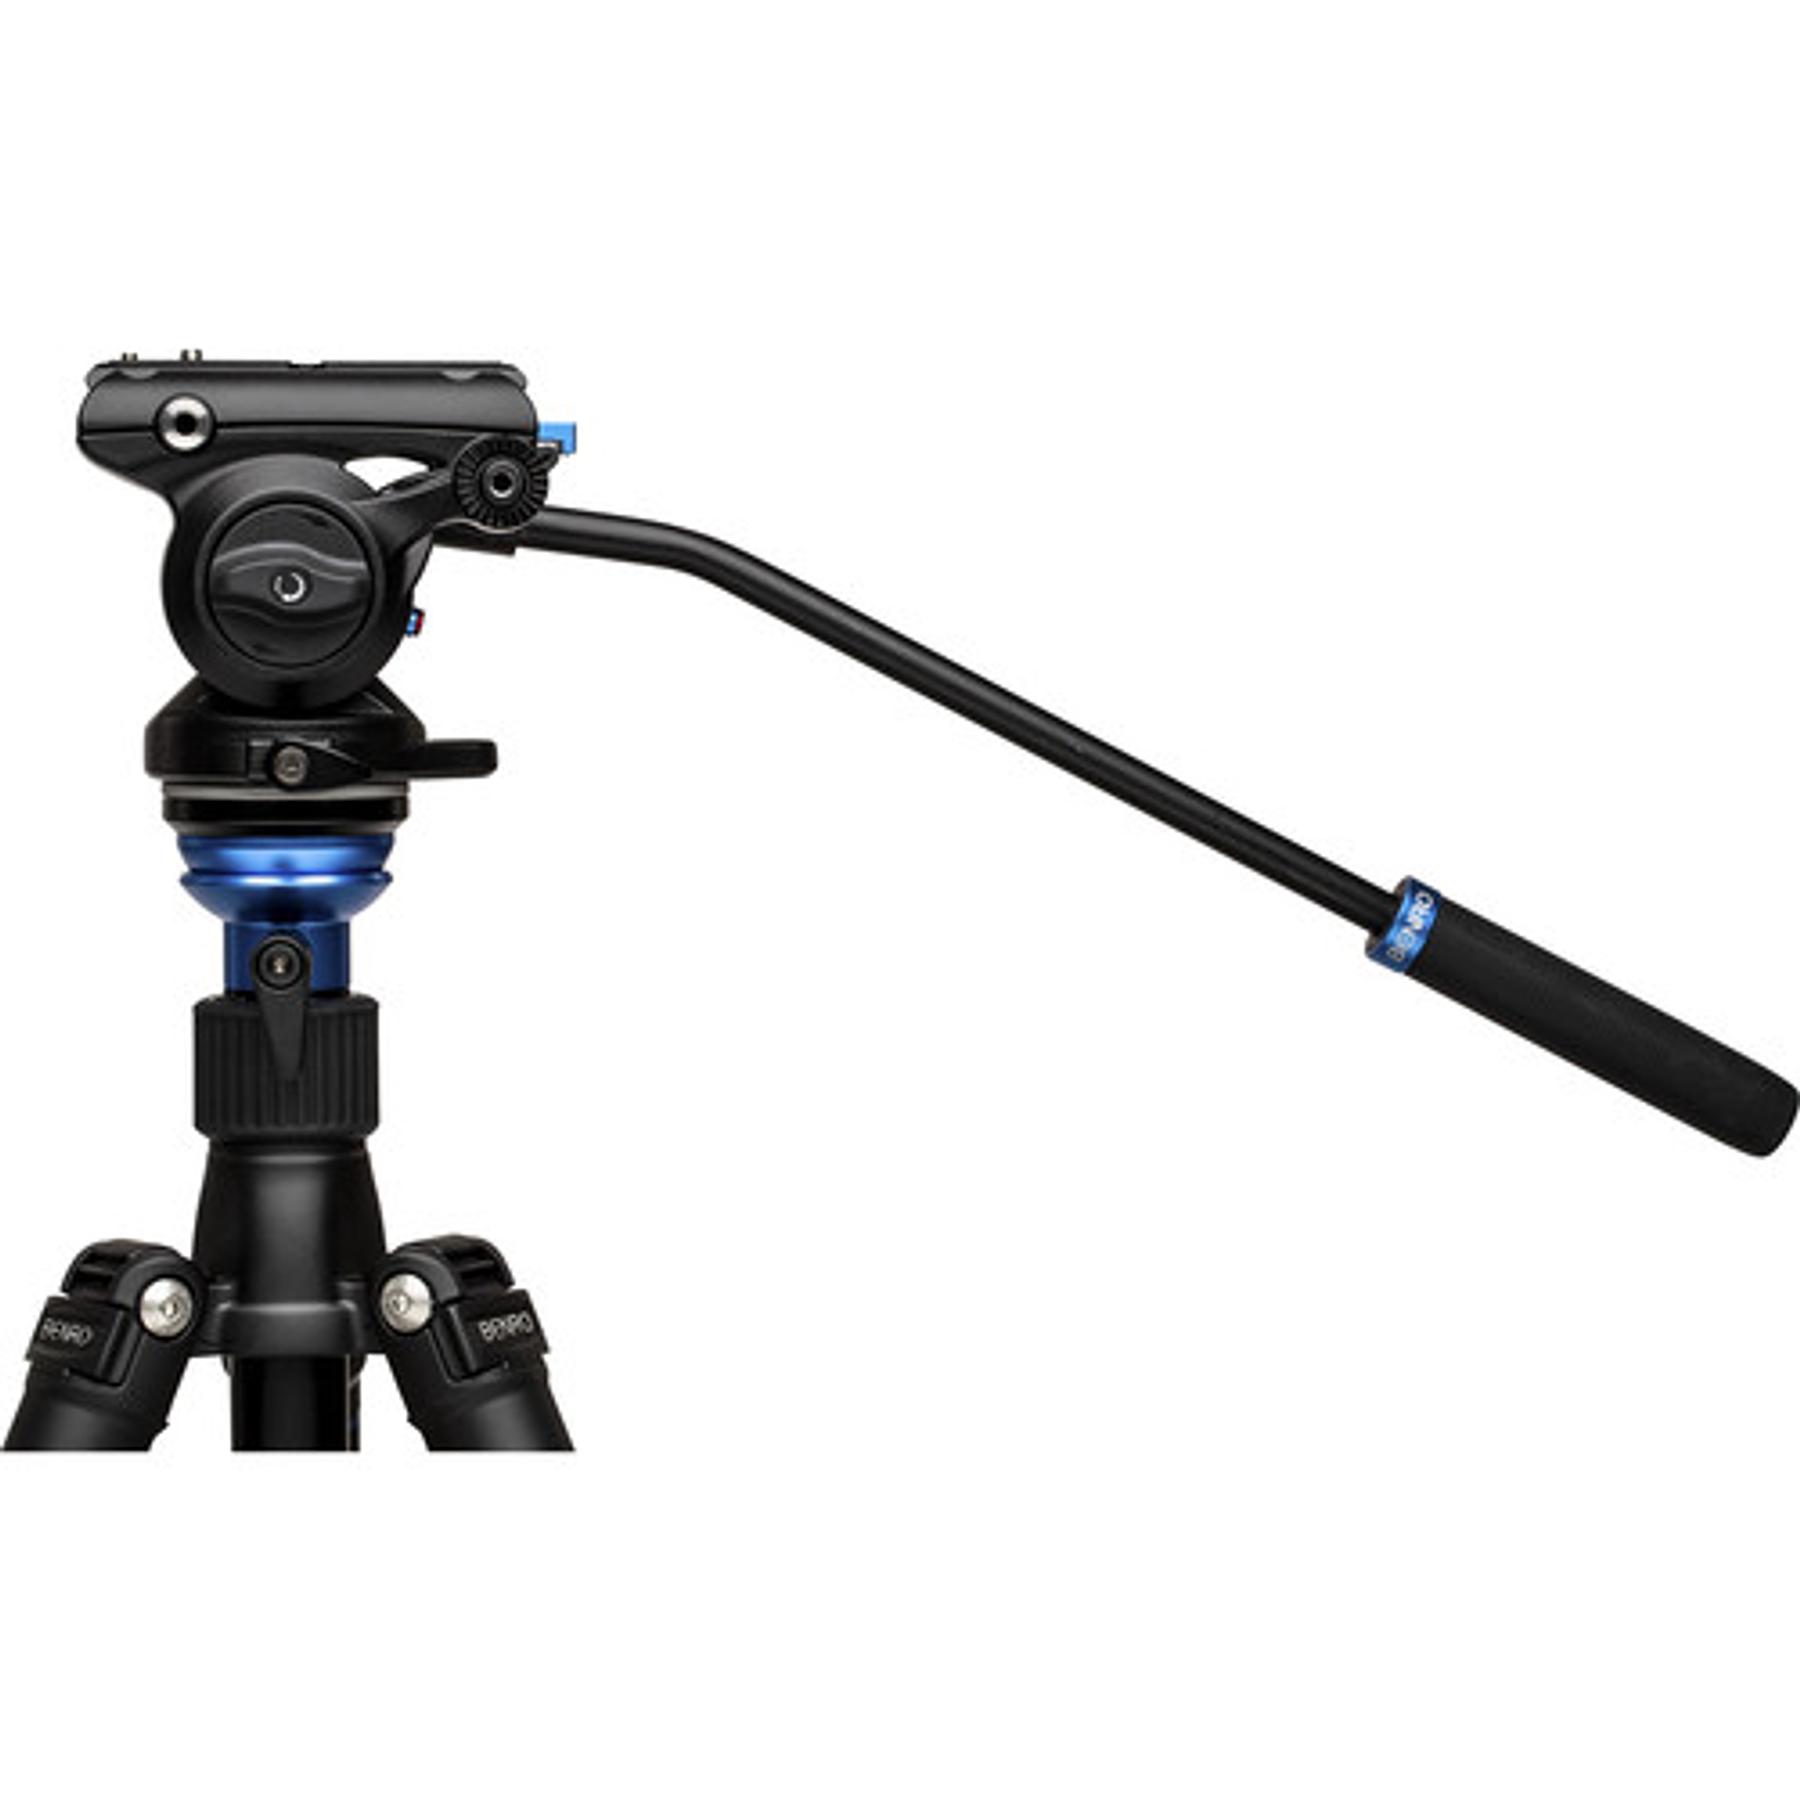 Cabezal de video fluido Benro S4Pro